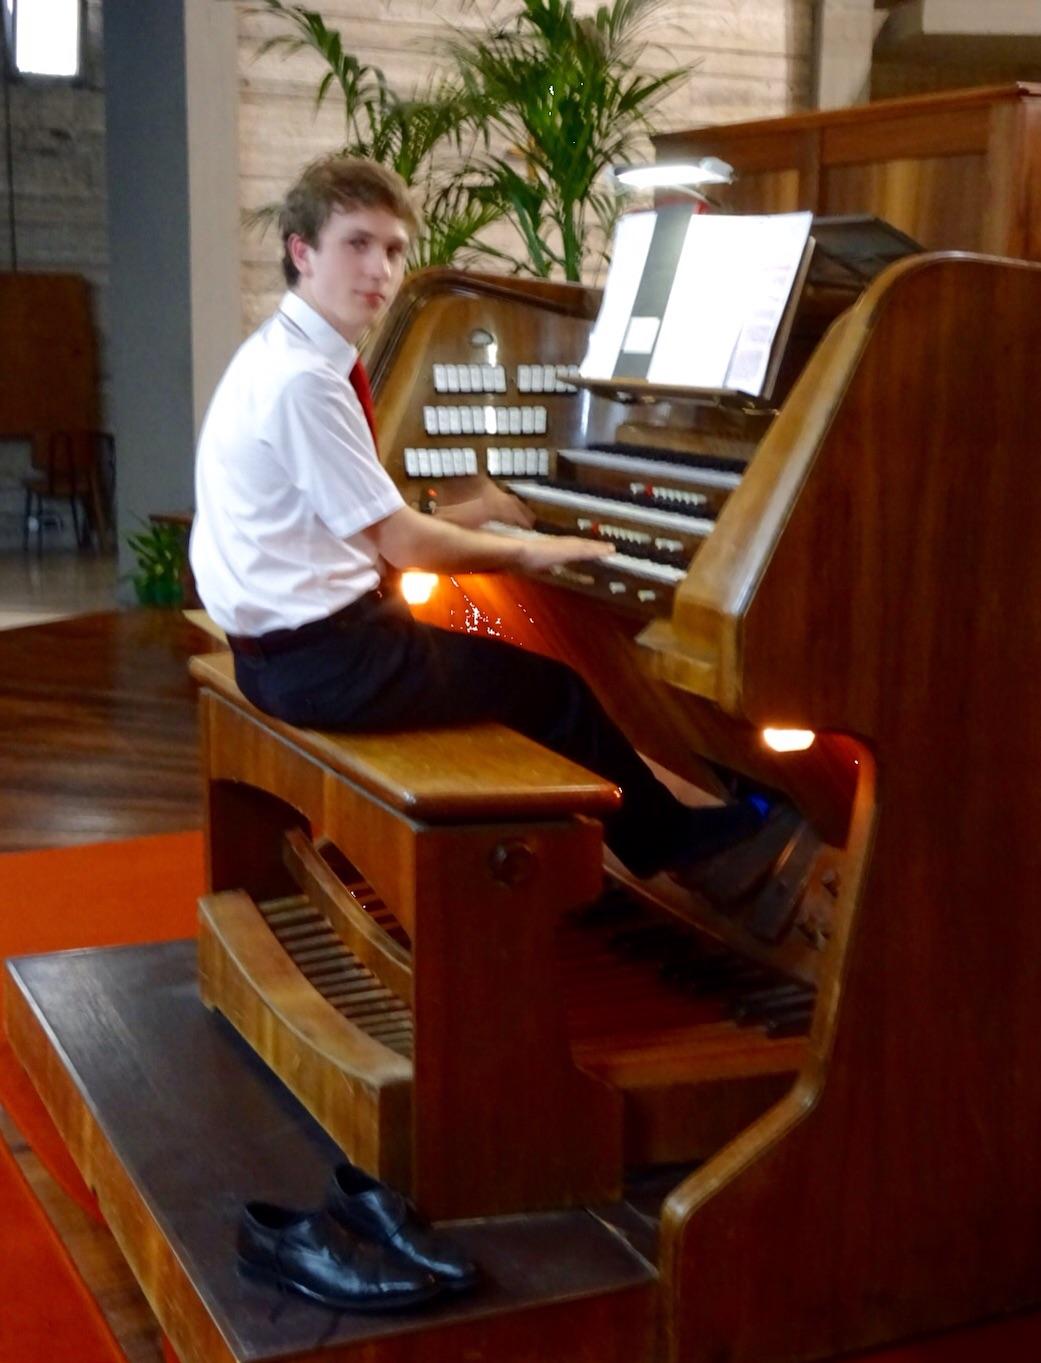 The shoeless organist entertains